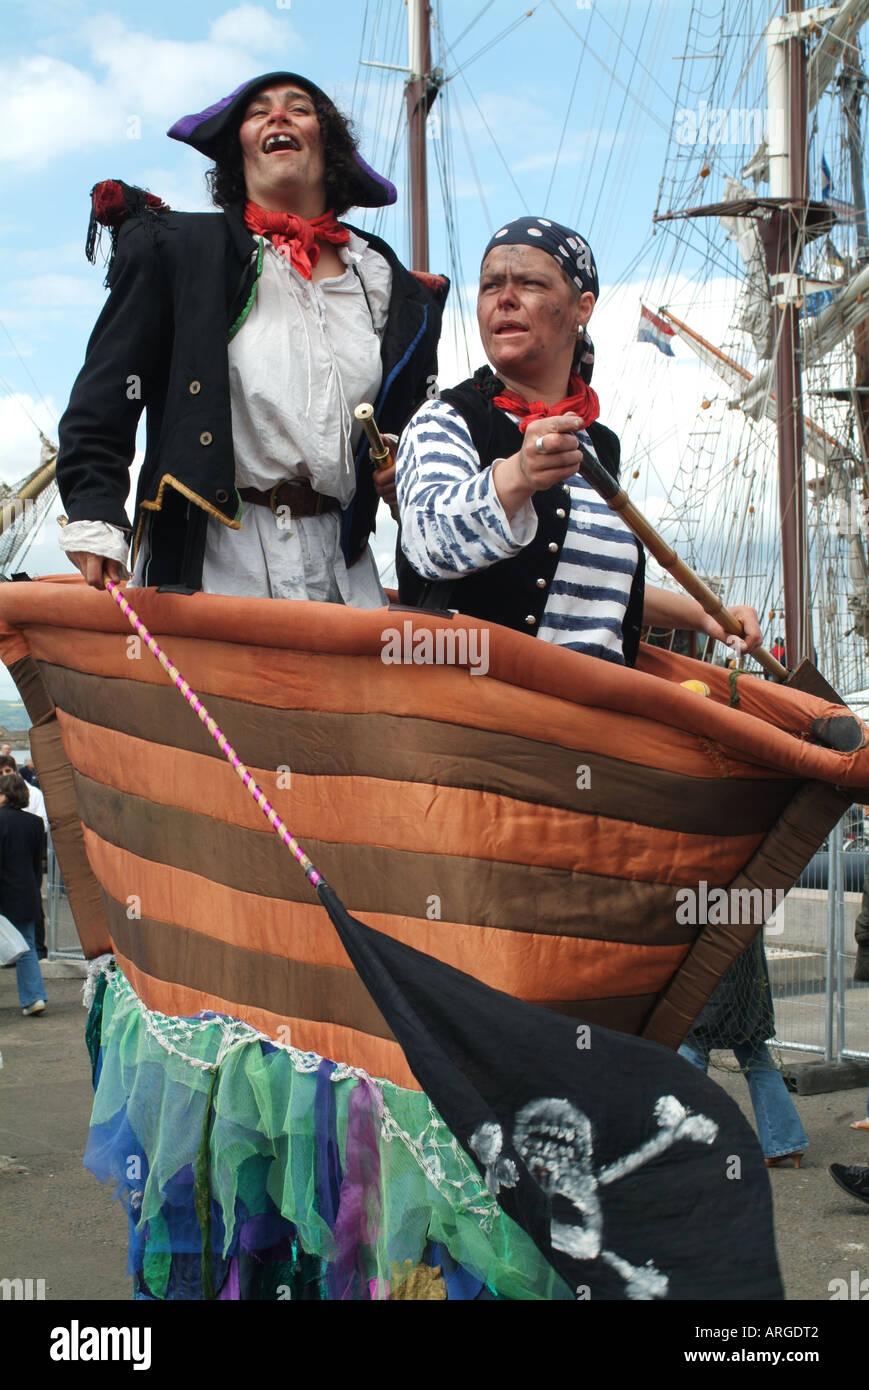 Pirate entertainers at the 2003 Edinburgh Festival of the Sea, Leith, Edinburgh, Scotland, UK - Stock Image